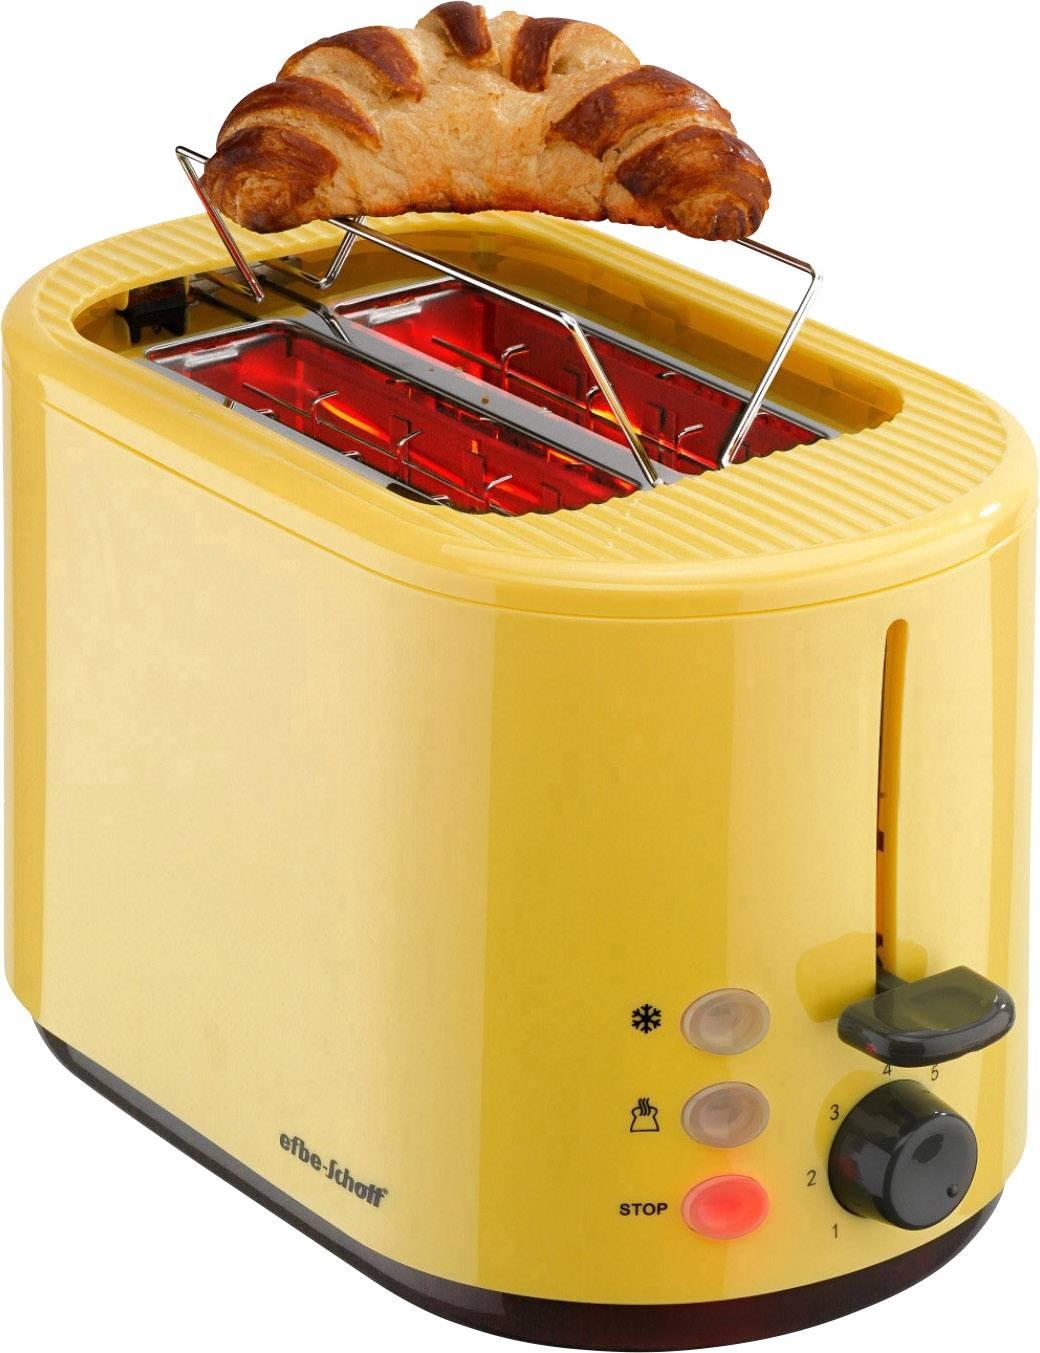 gelb Efbe-Schott Automatik-Toaster SC TO 1080.1